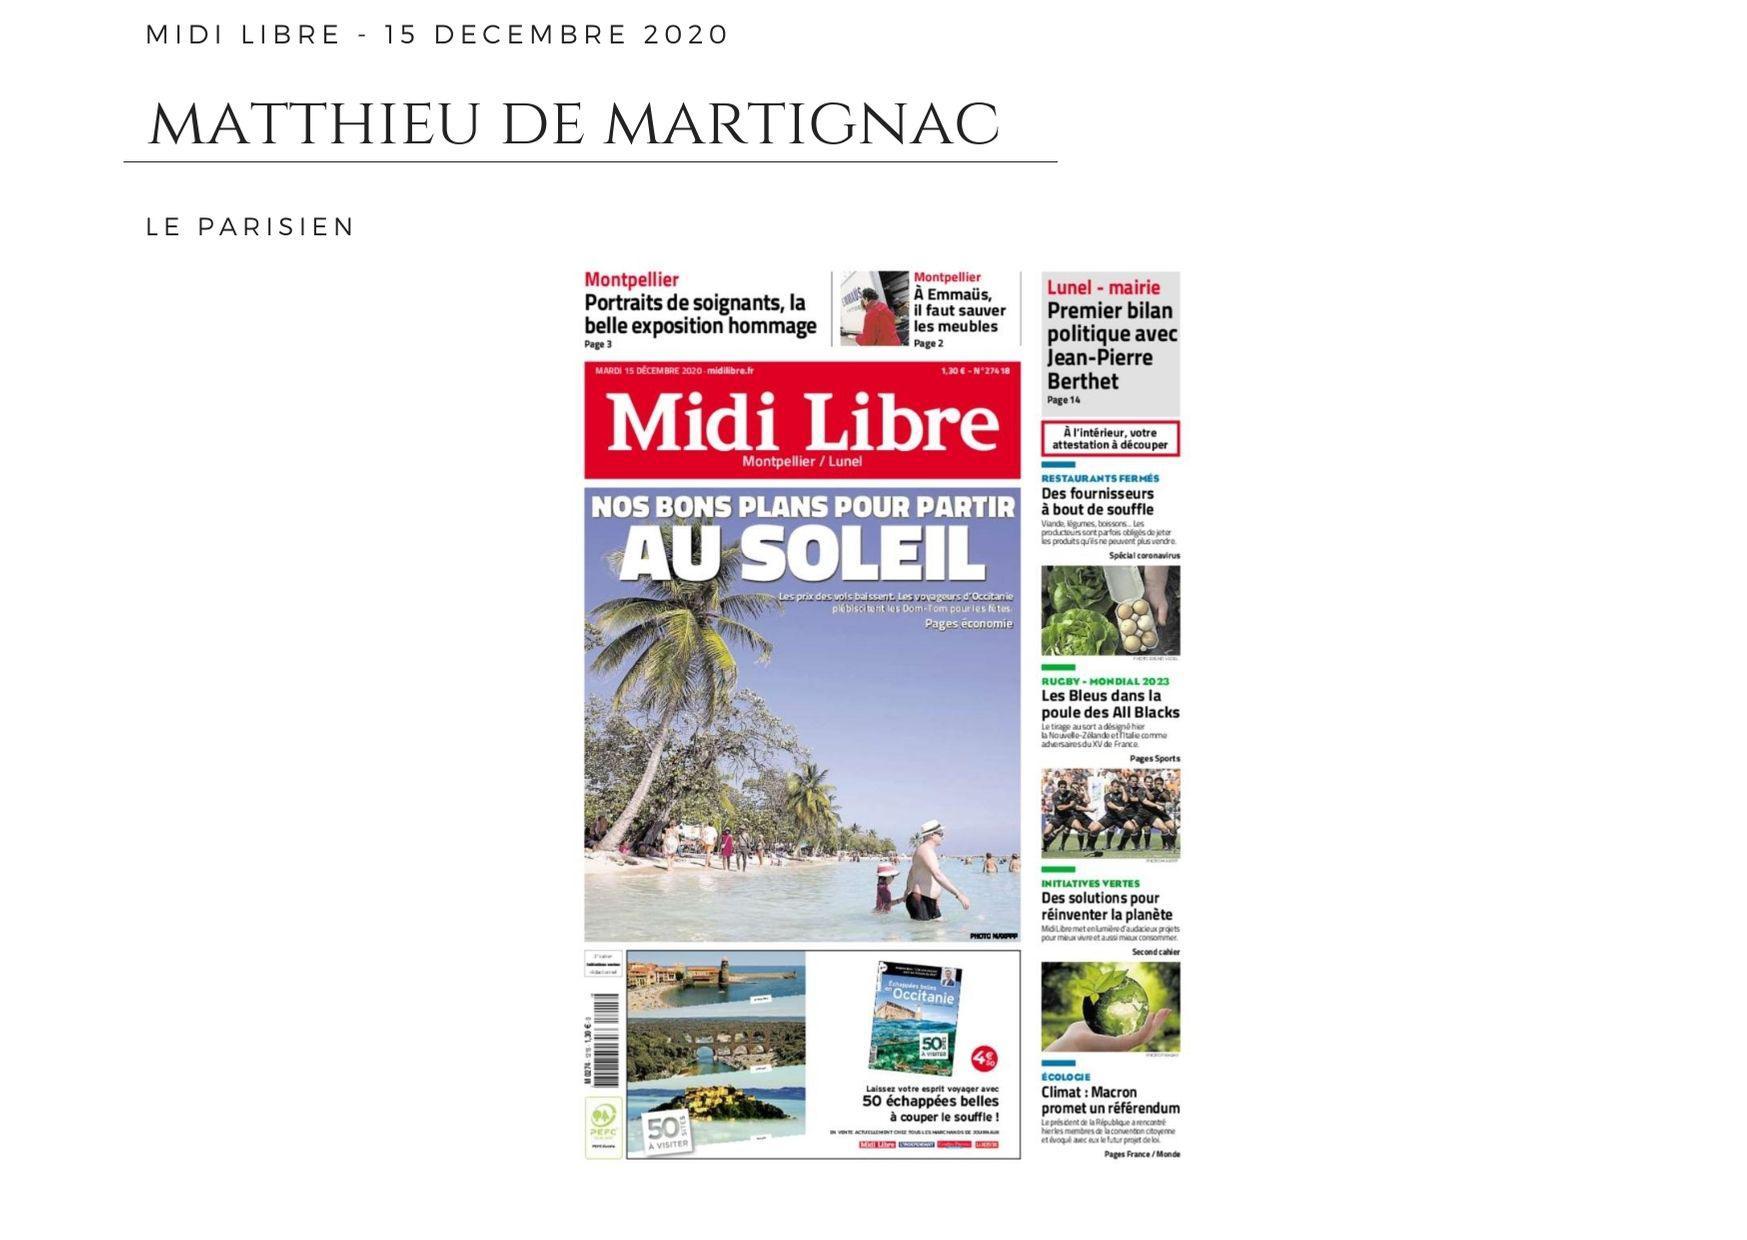 Midi Libre - 15 décembre 2020